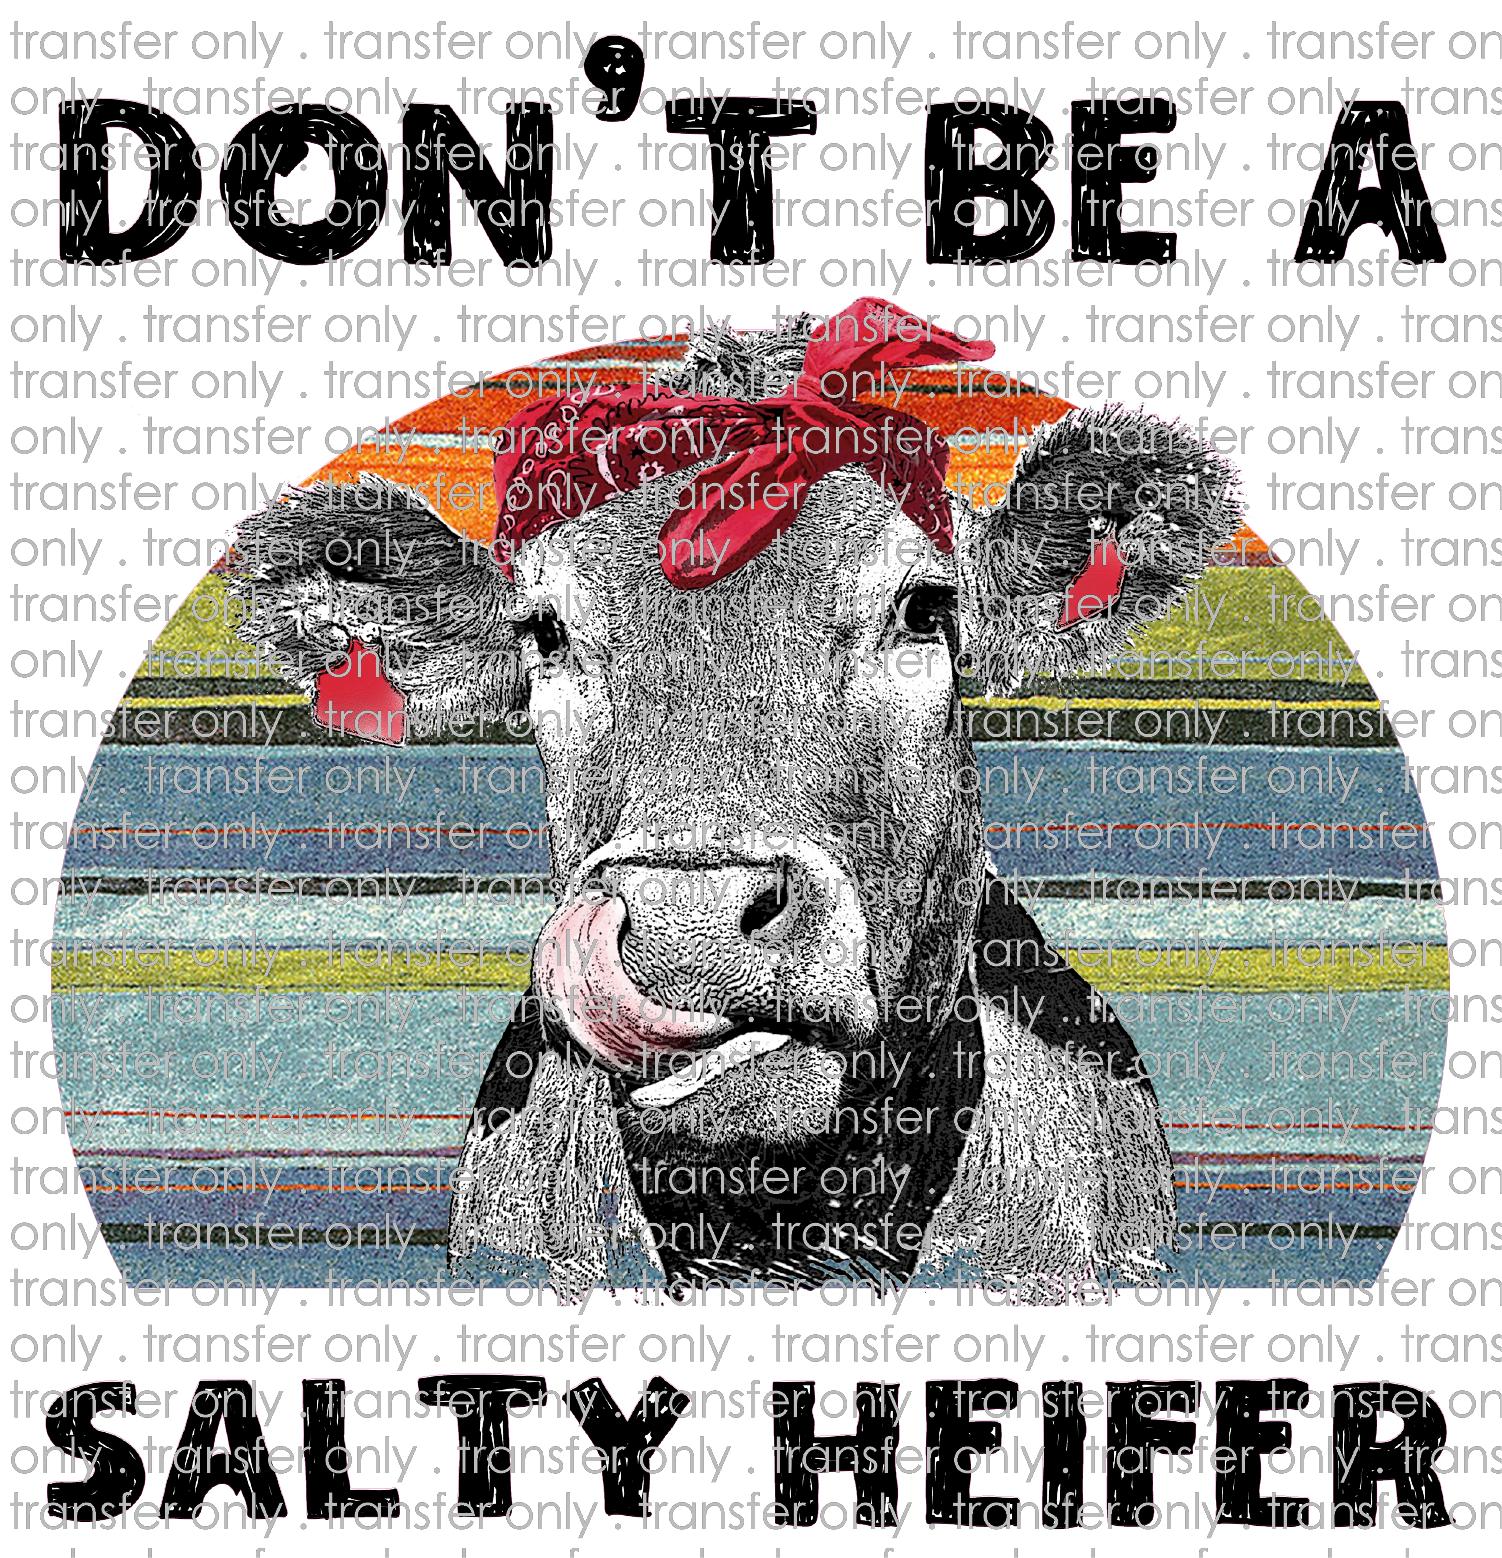 Siser Anm 17 Don T Be A Salty Heifer Taylored Vinyl